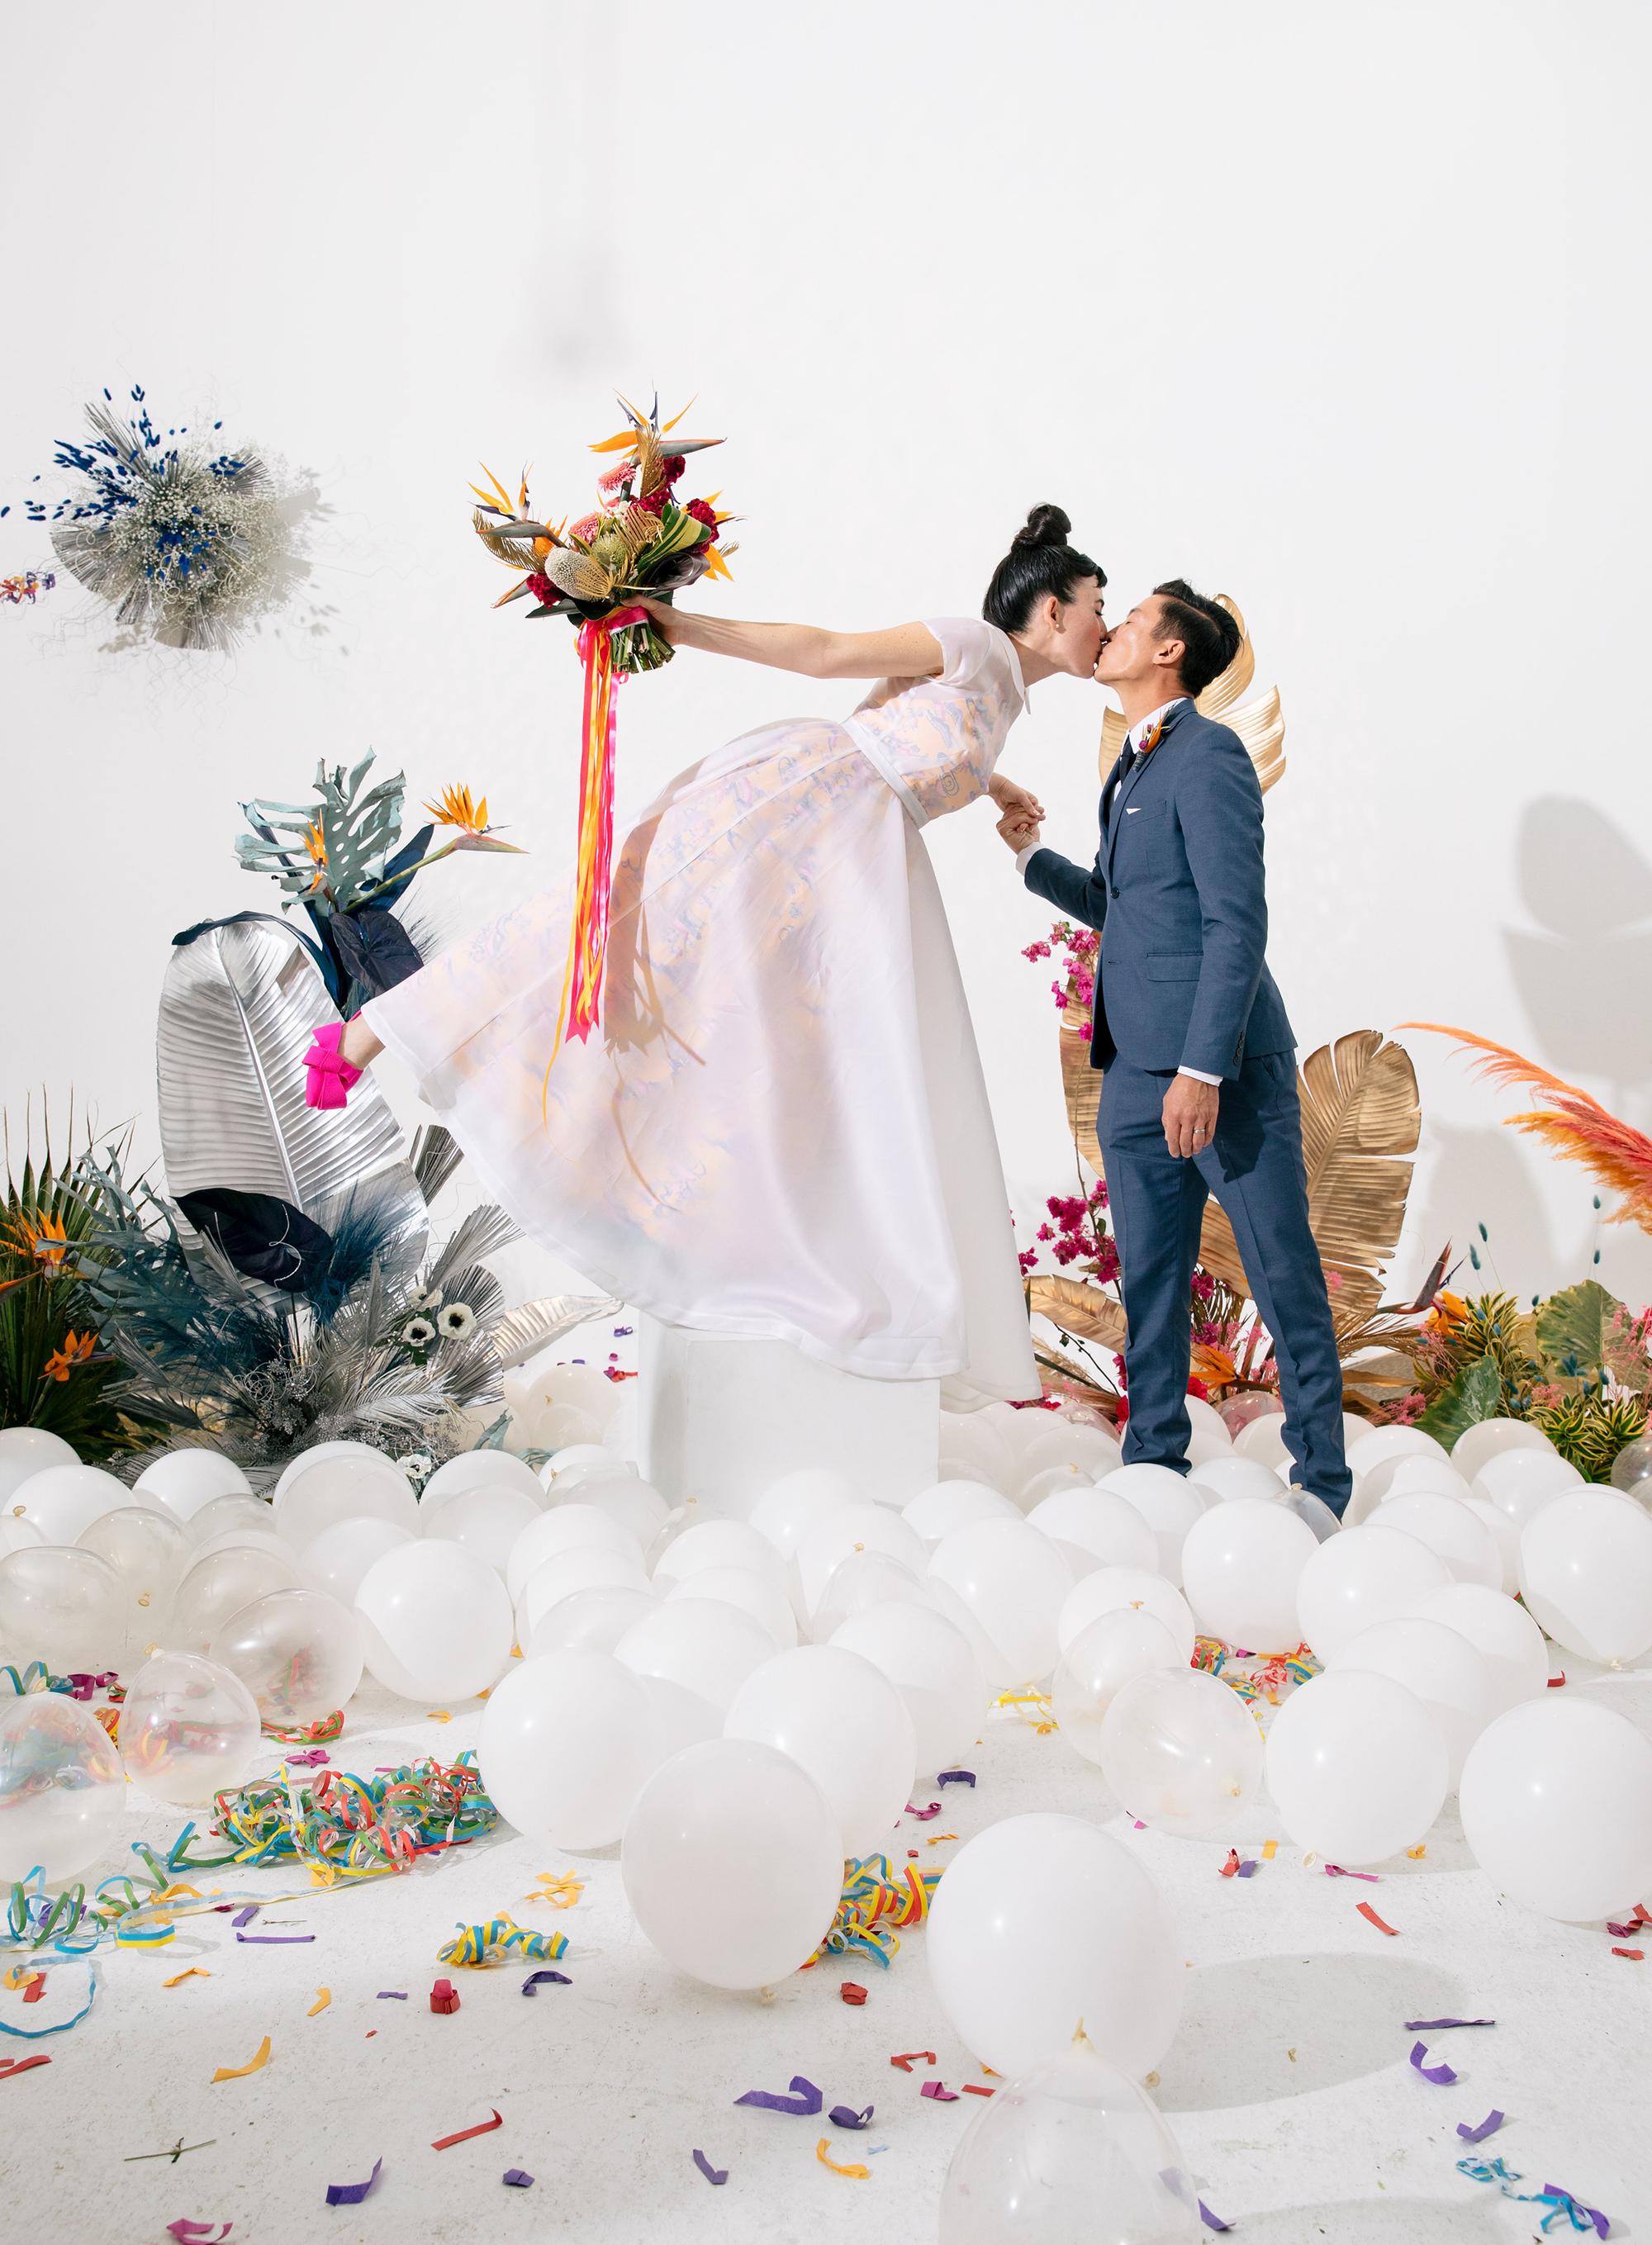 tashina huy colorful wedding couple kiss